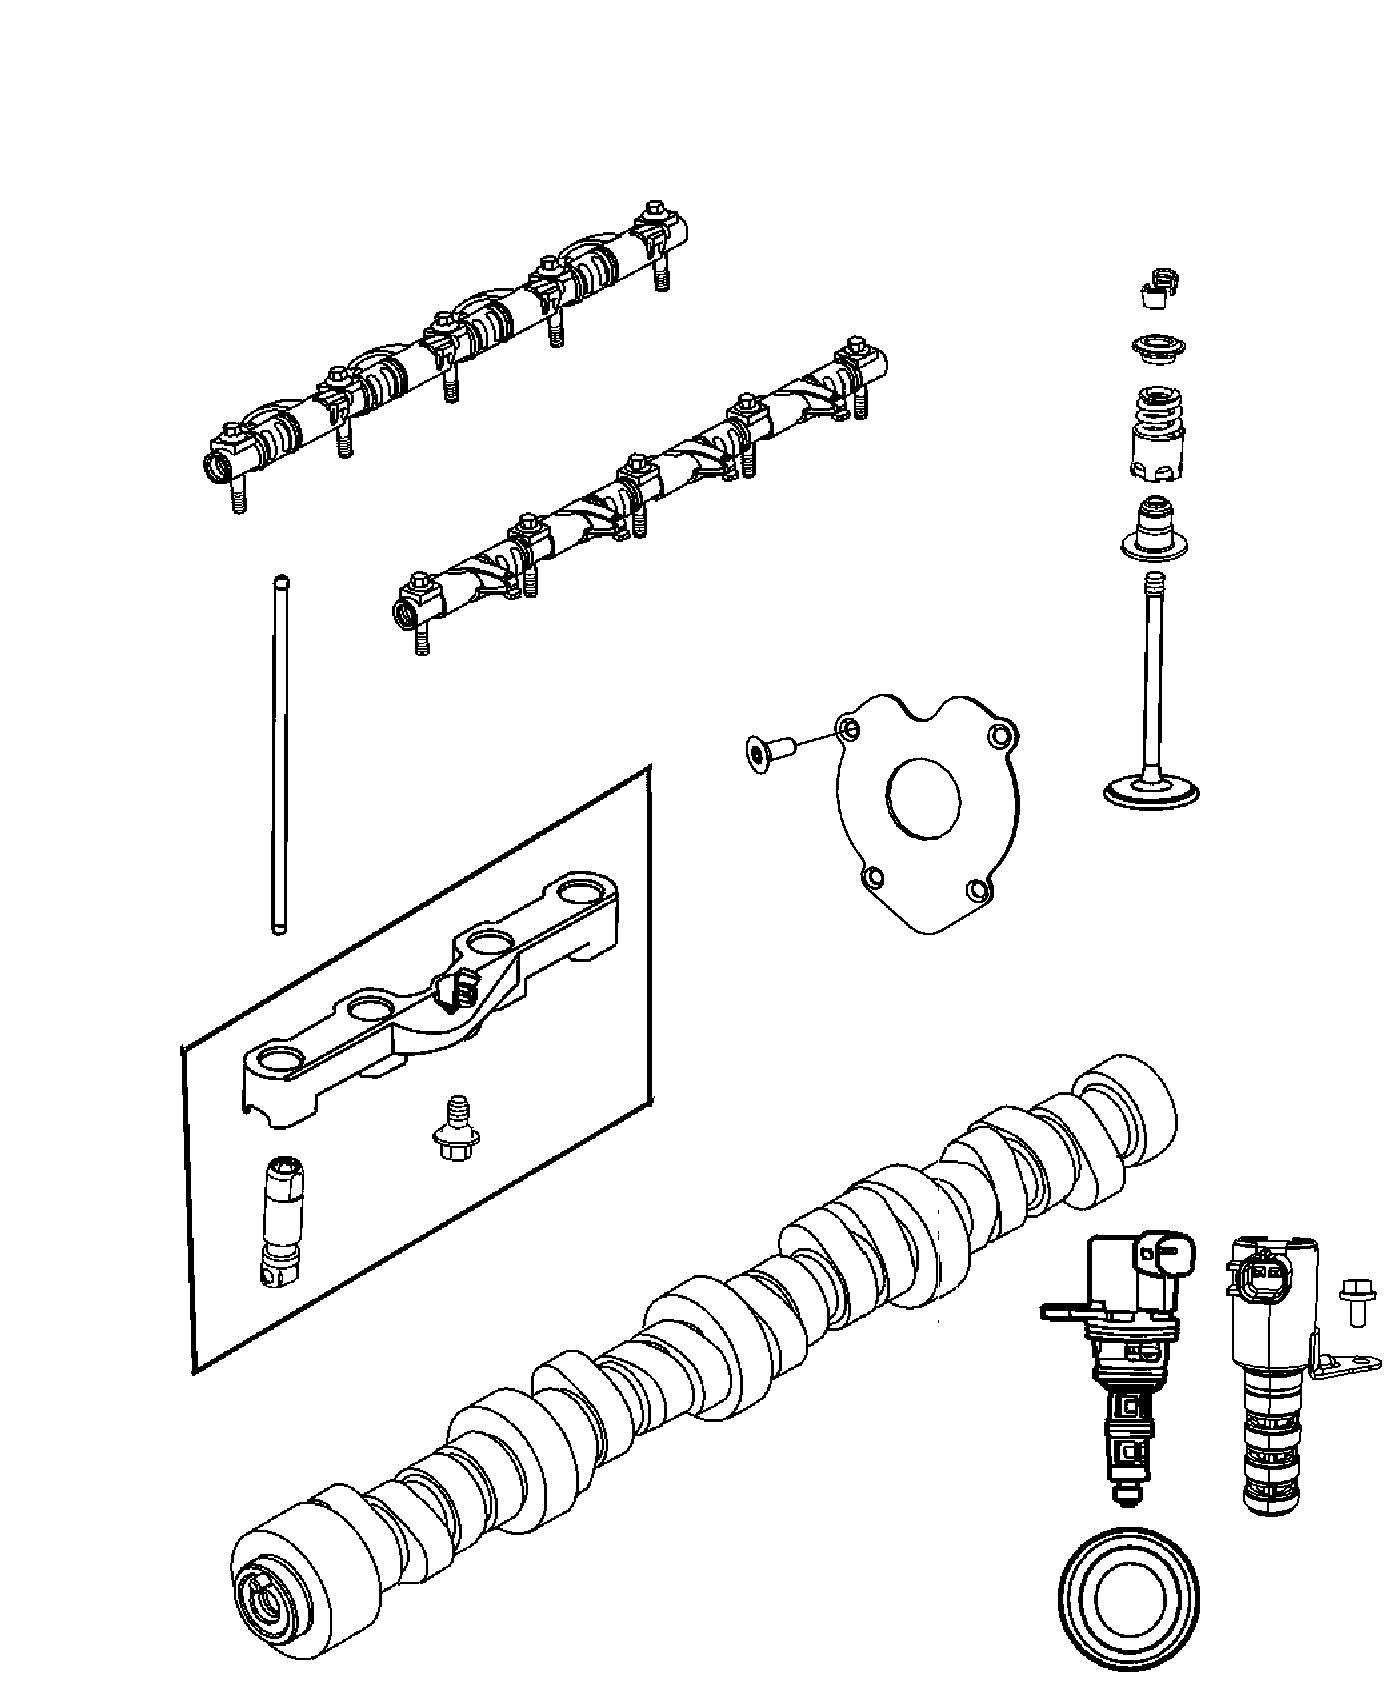 Dodge Ram Camshaft Engine Valvetrain System